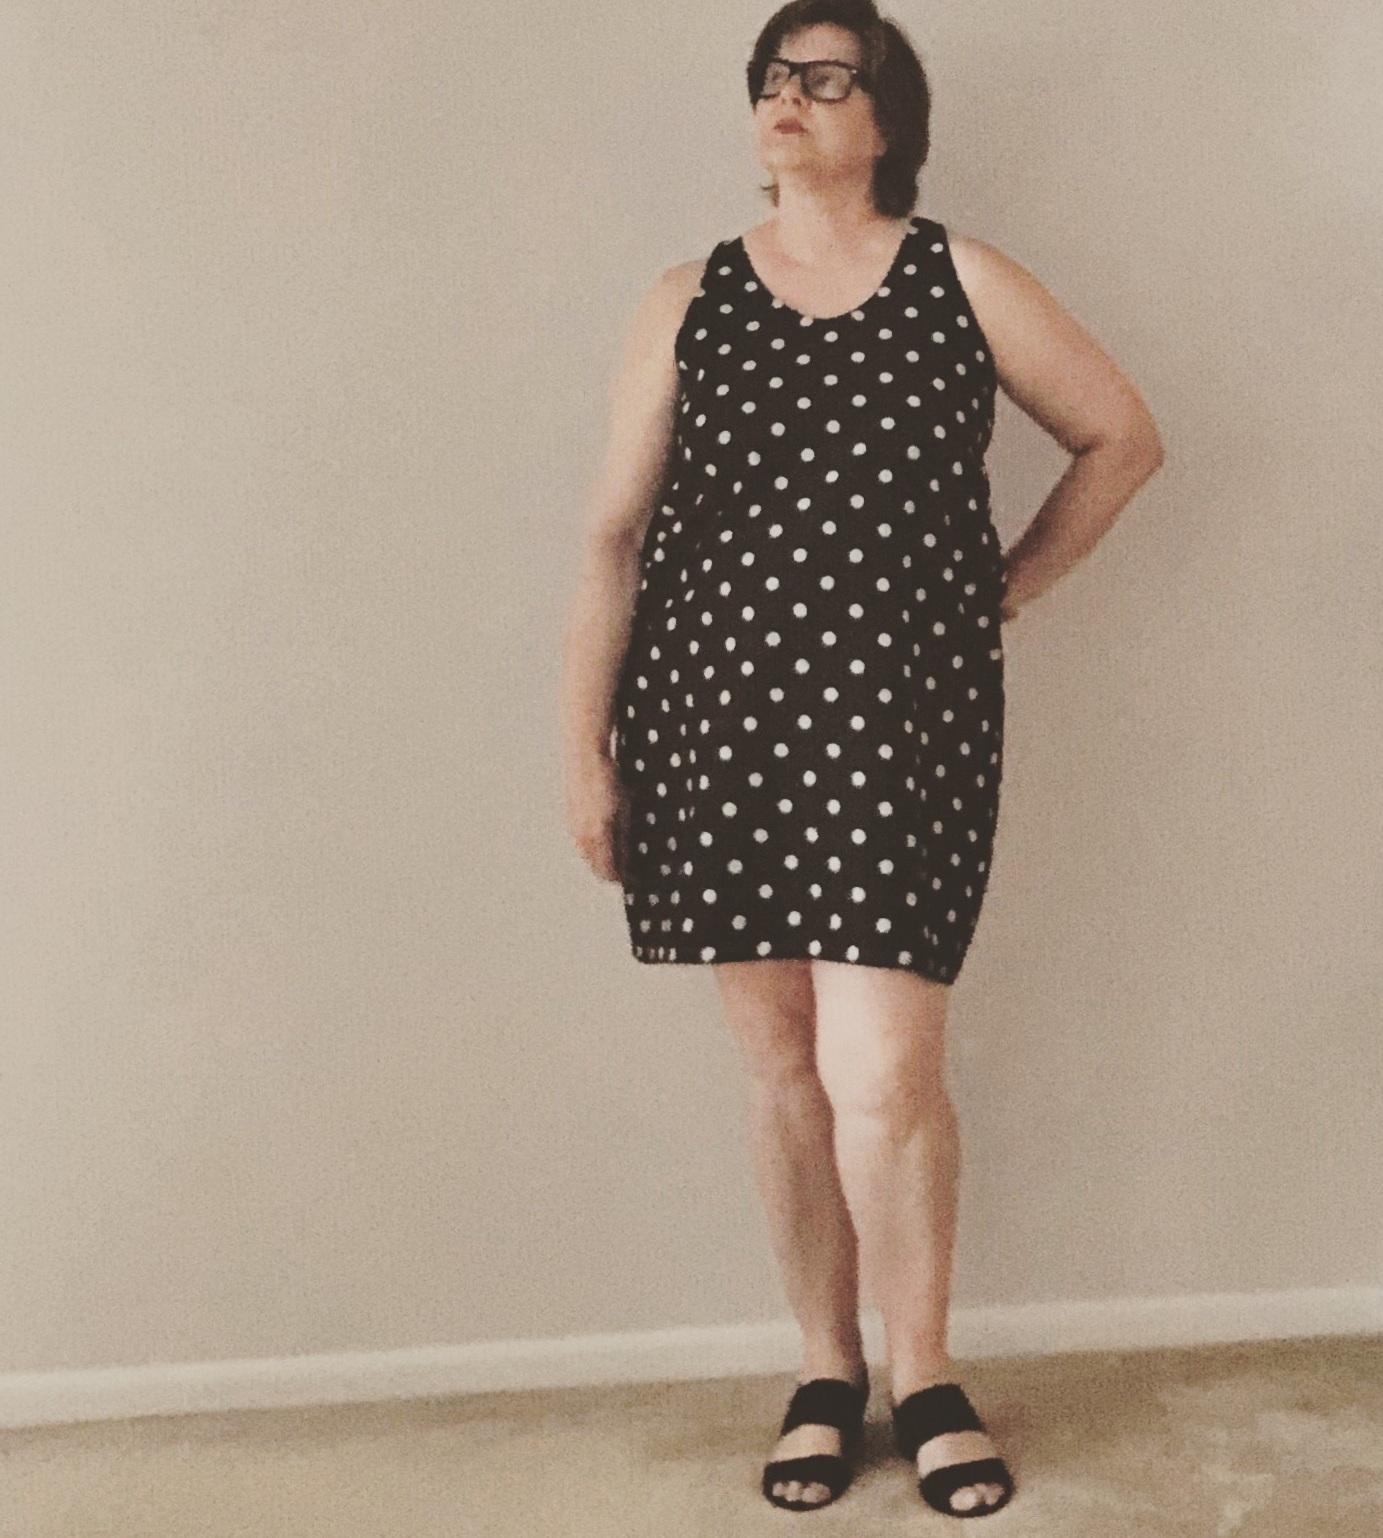 Slip Dress sewing pattern, by Ann Normandy Design